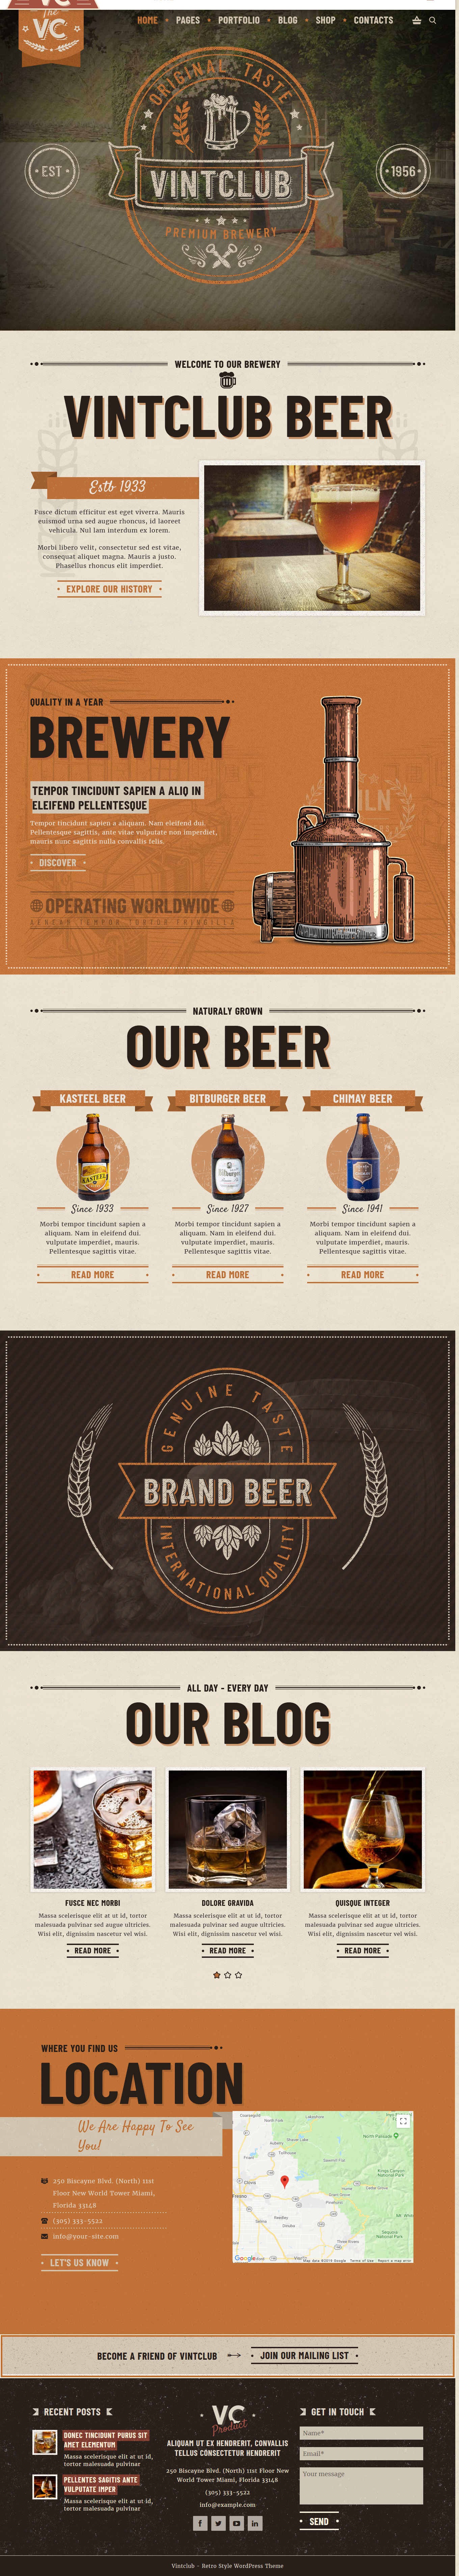 VintClub - Best Premium Bar and Pub WordPress Theme